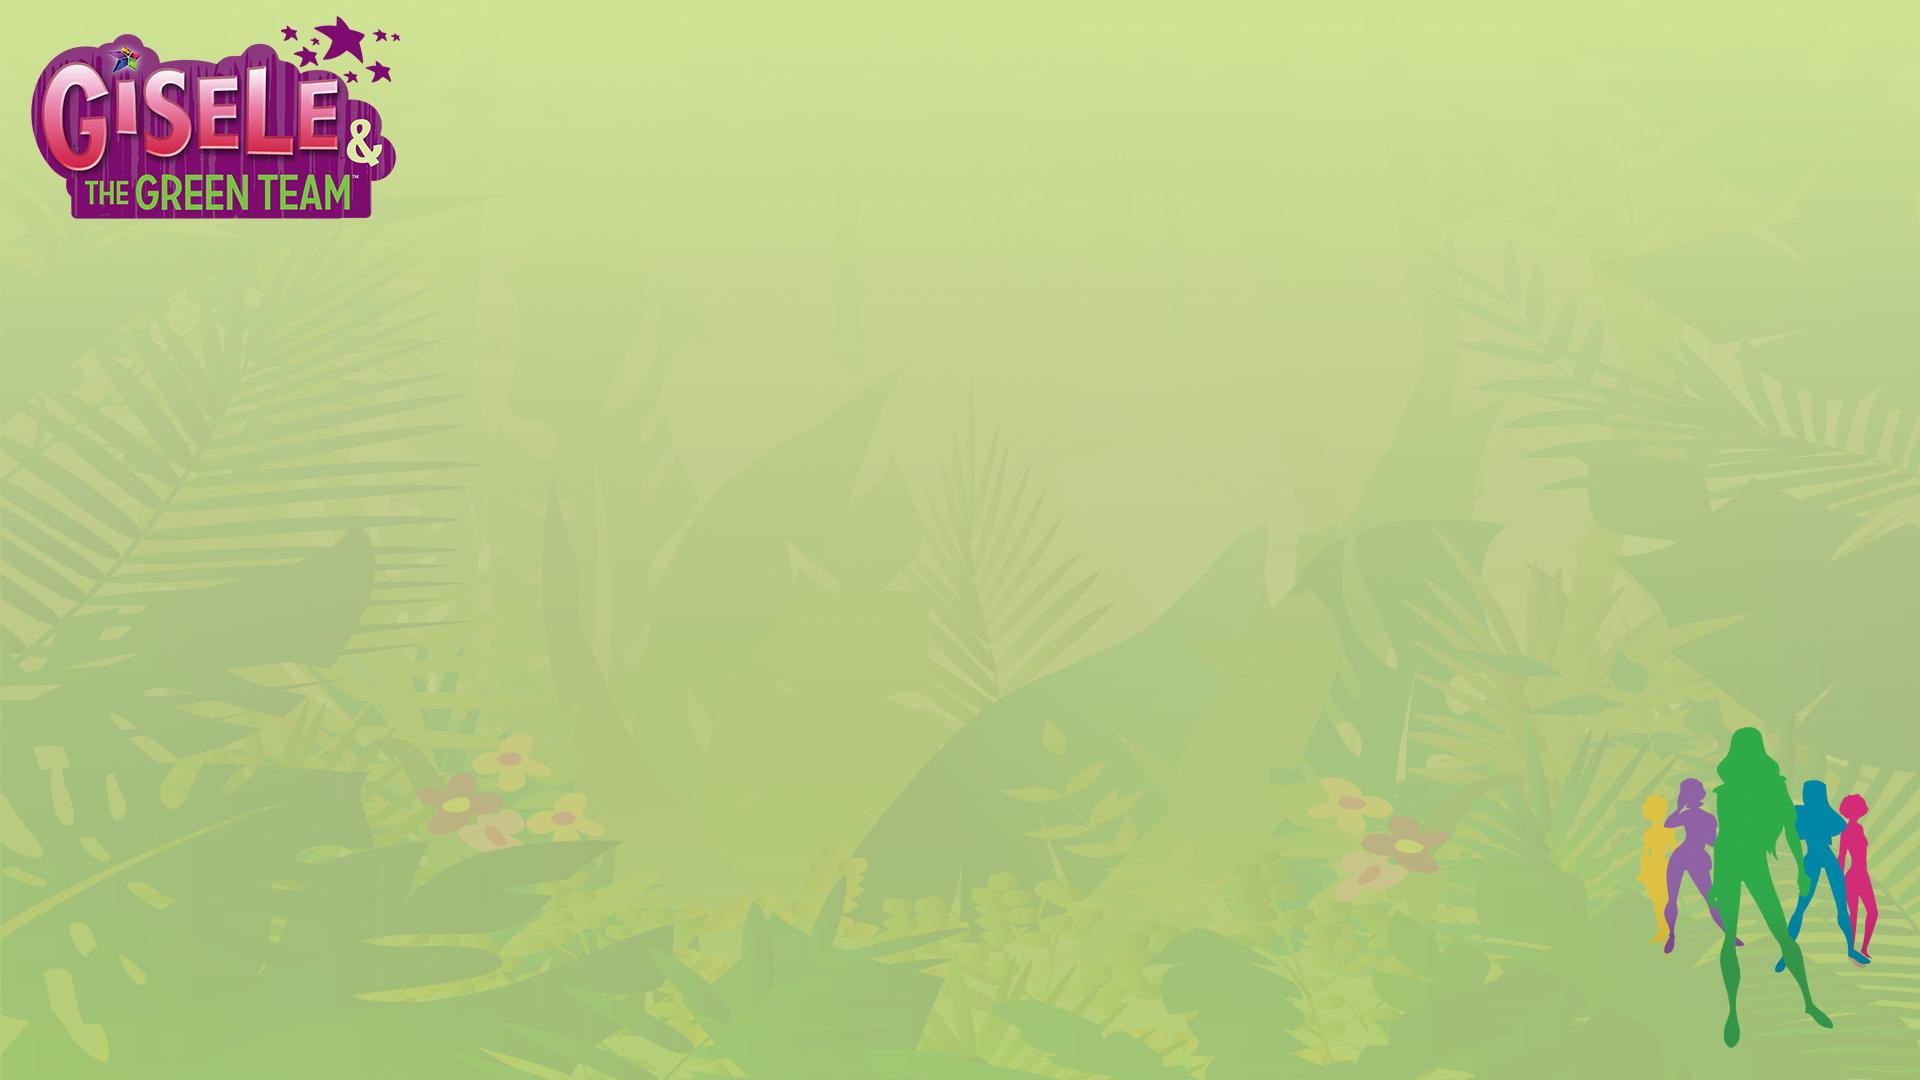 Gisele and the Green Team - Season 1